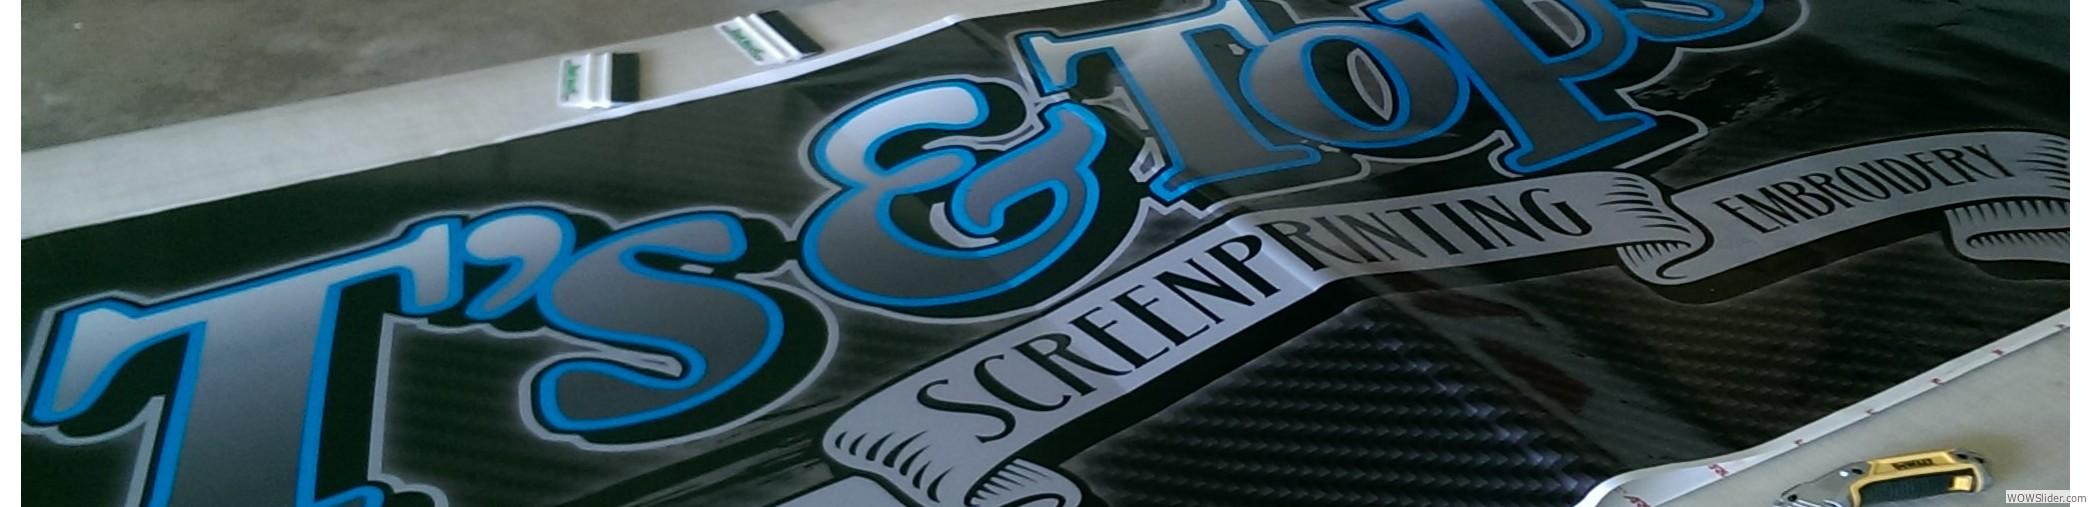 Home - T's & Tops - Modesto CA - Screen Printing